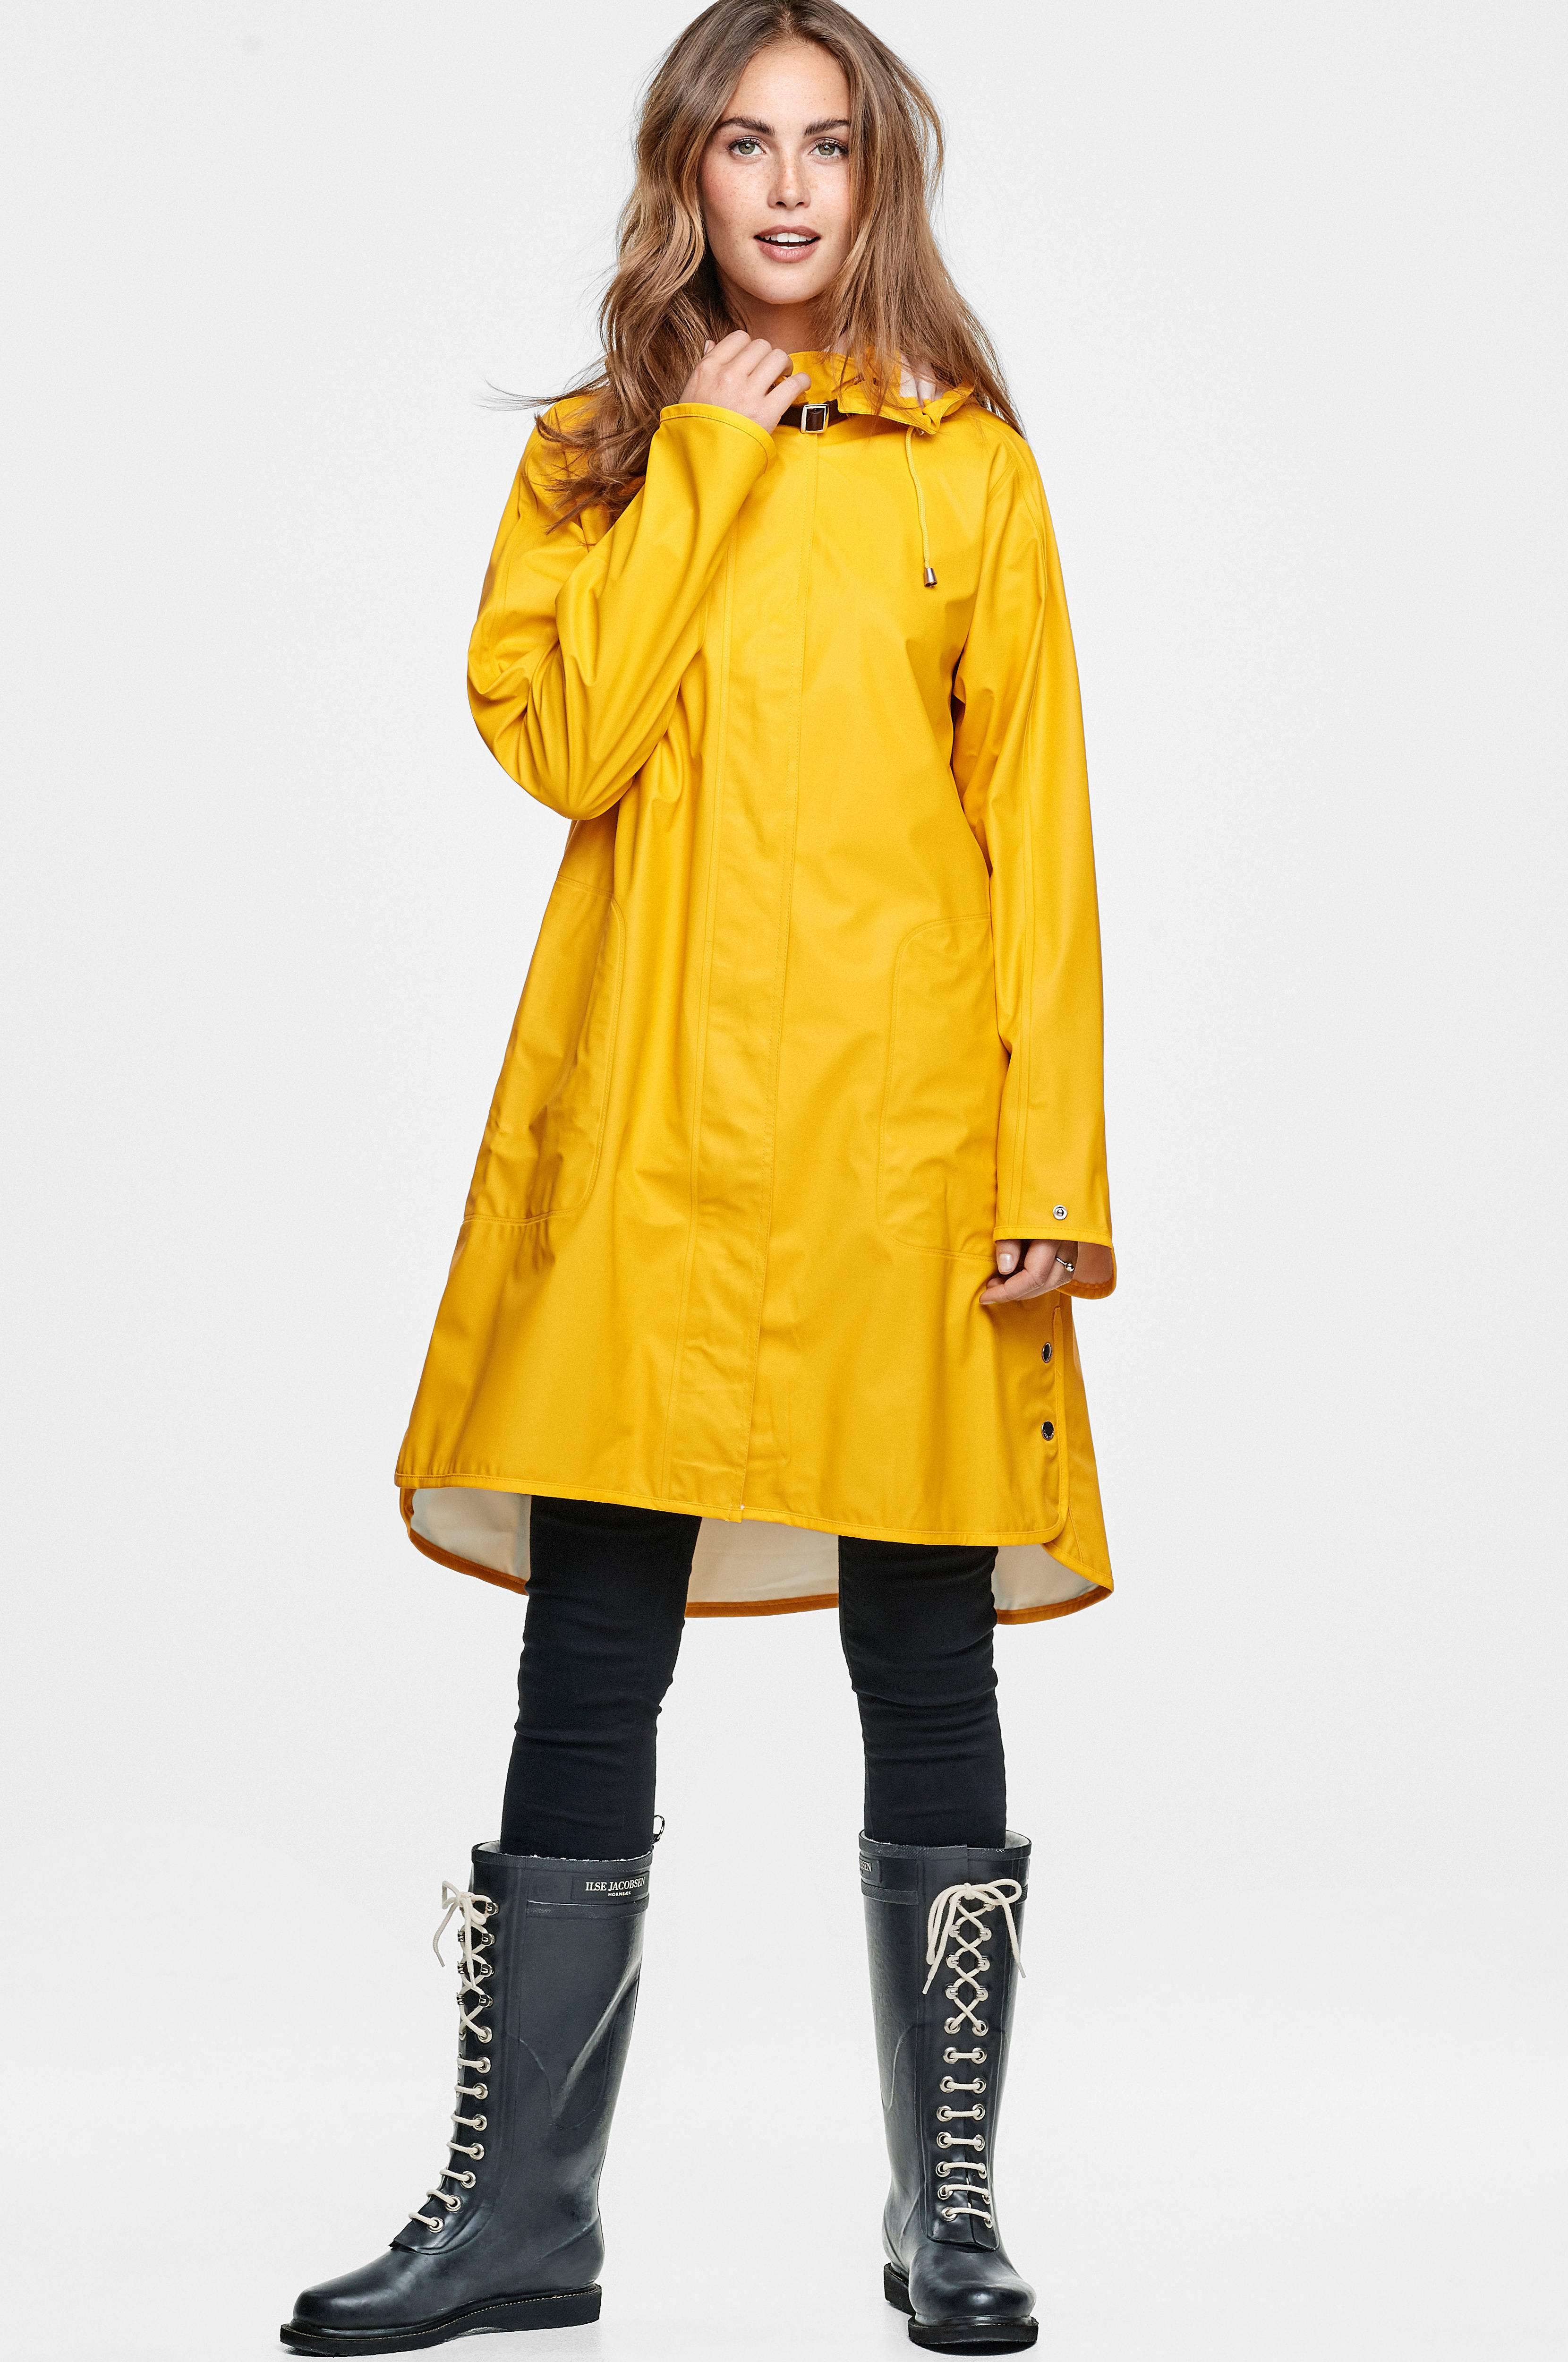 275b0f55 Ilse Jacobsen Regnfrakk Rain71 - Gul - Dame - Ellos.no